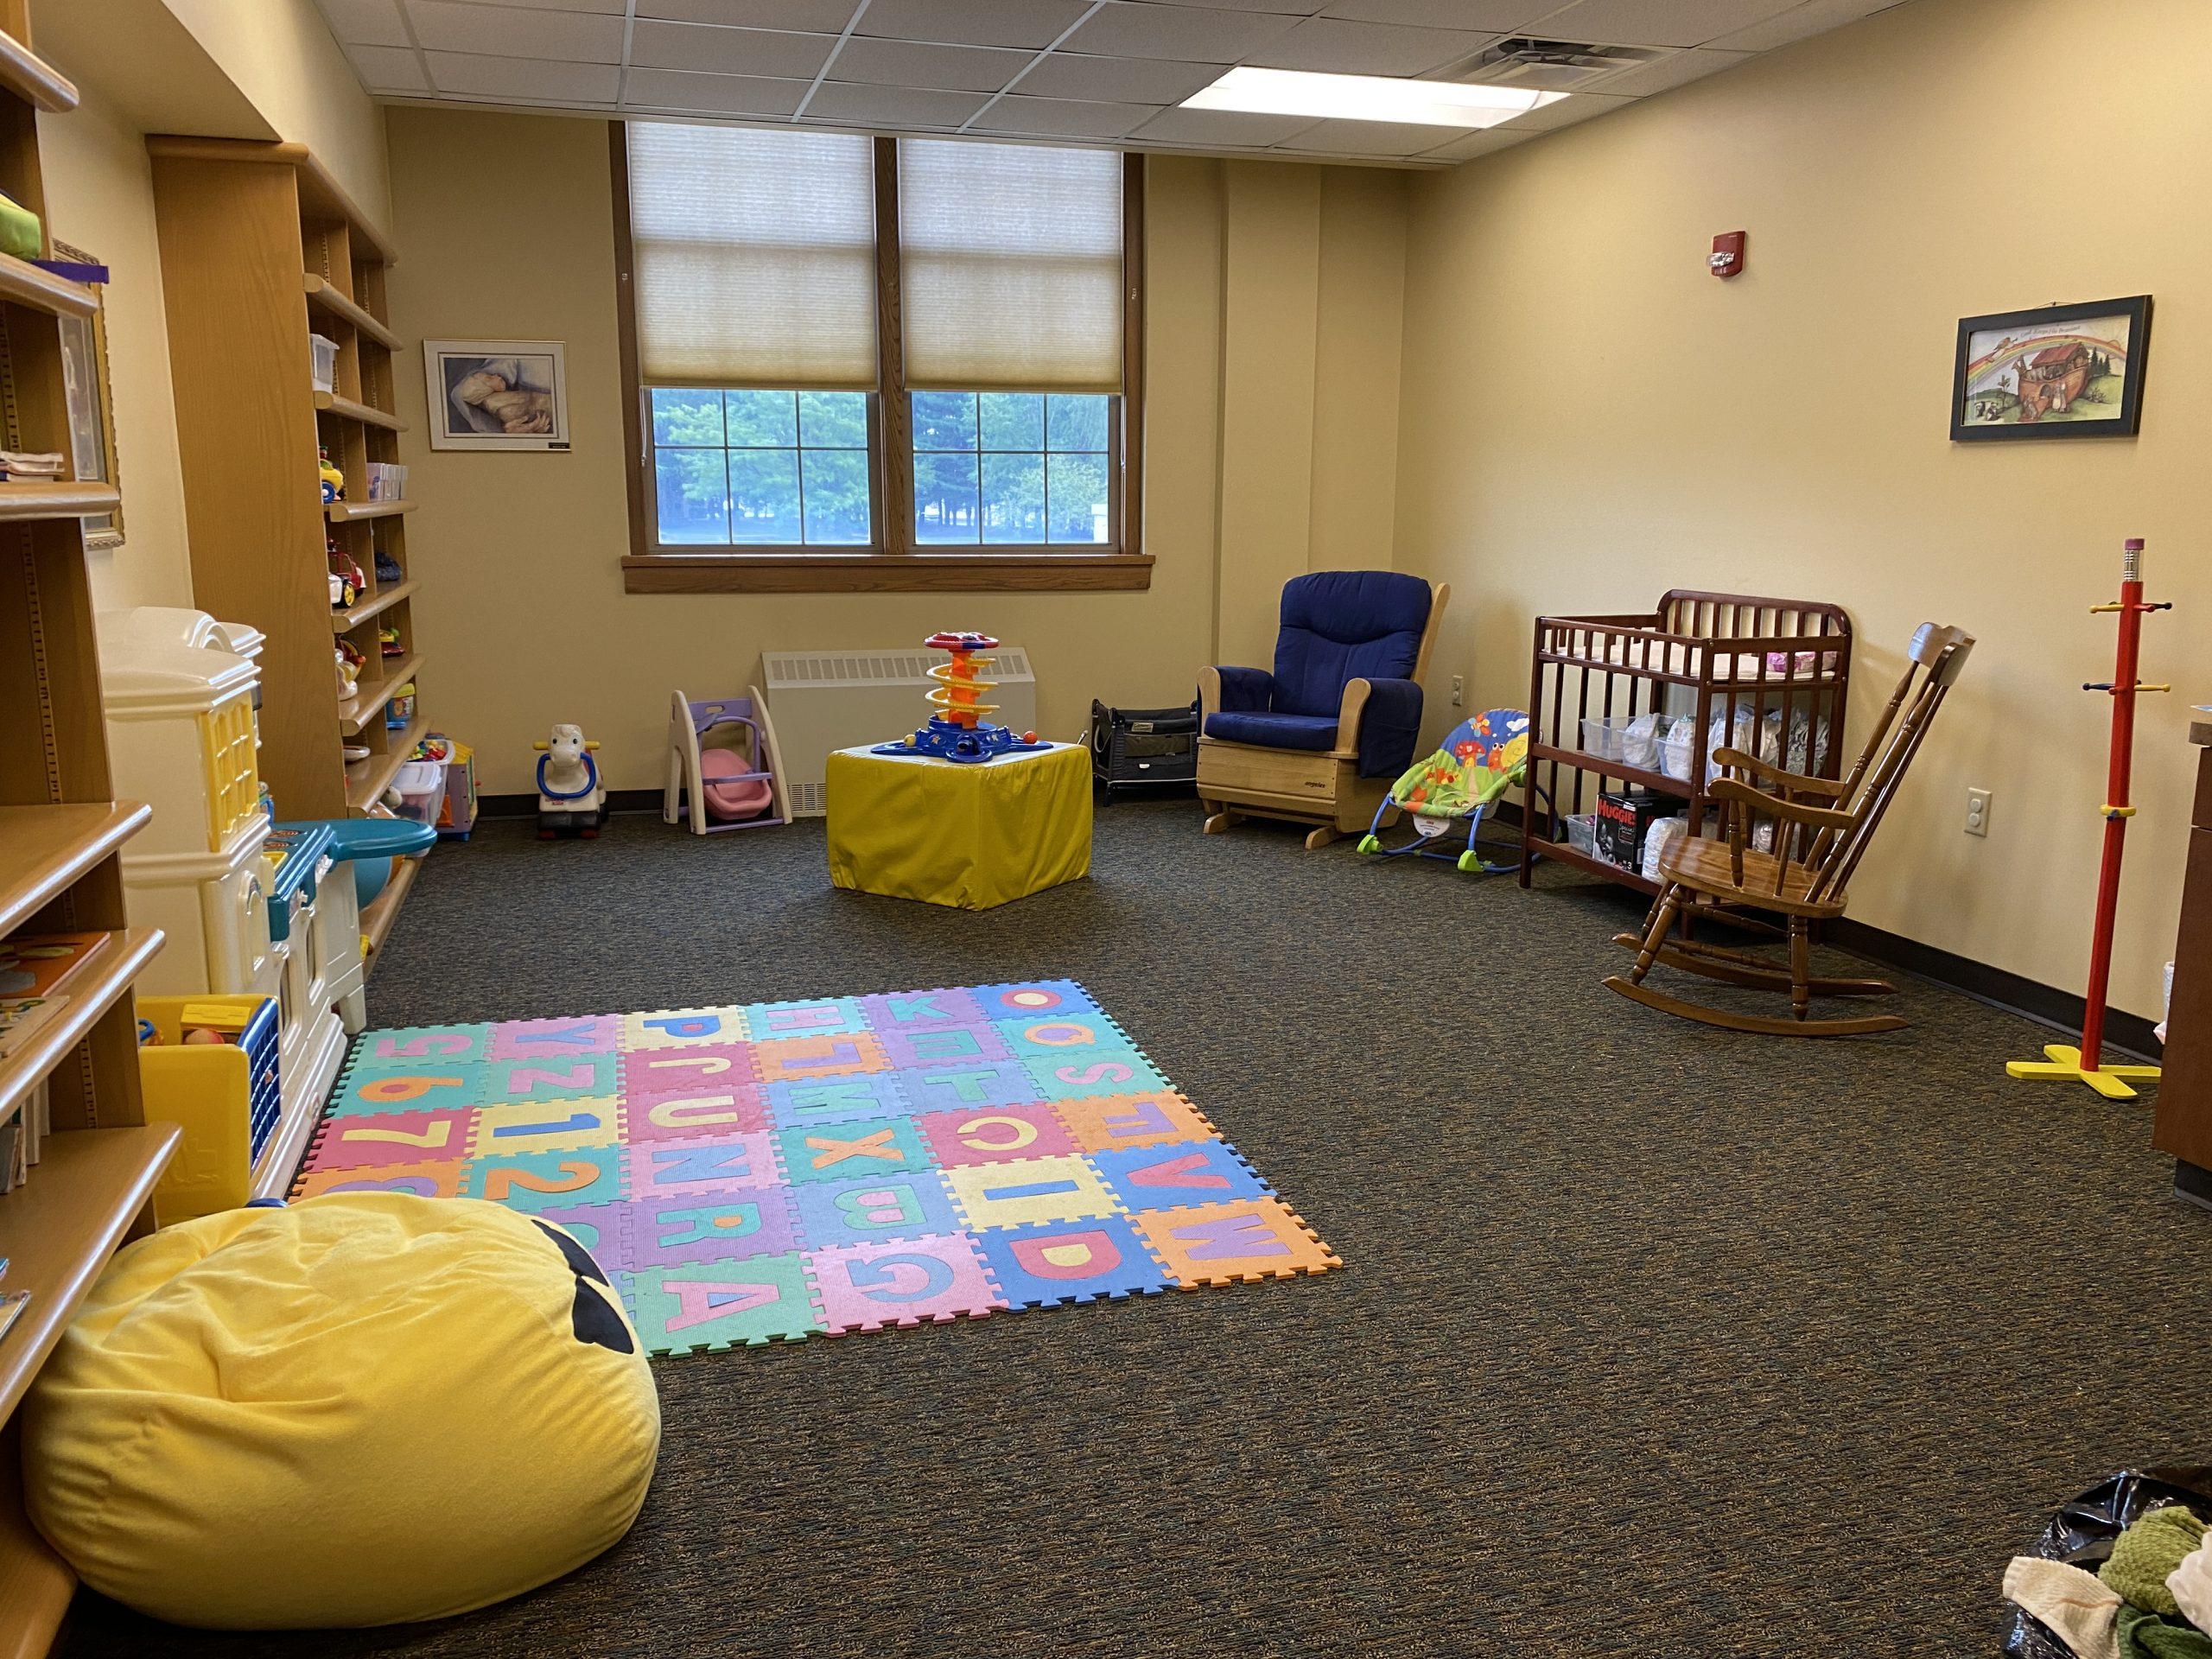 Nursery at First Lutheran Church in Janesville